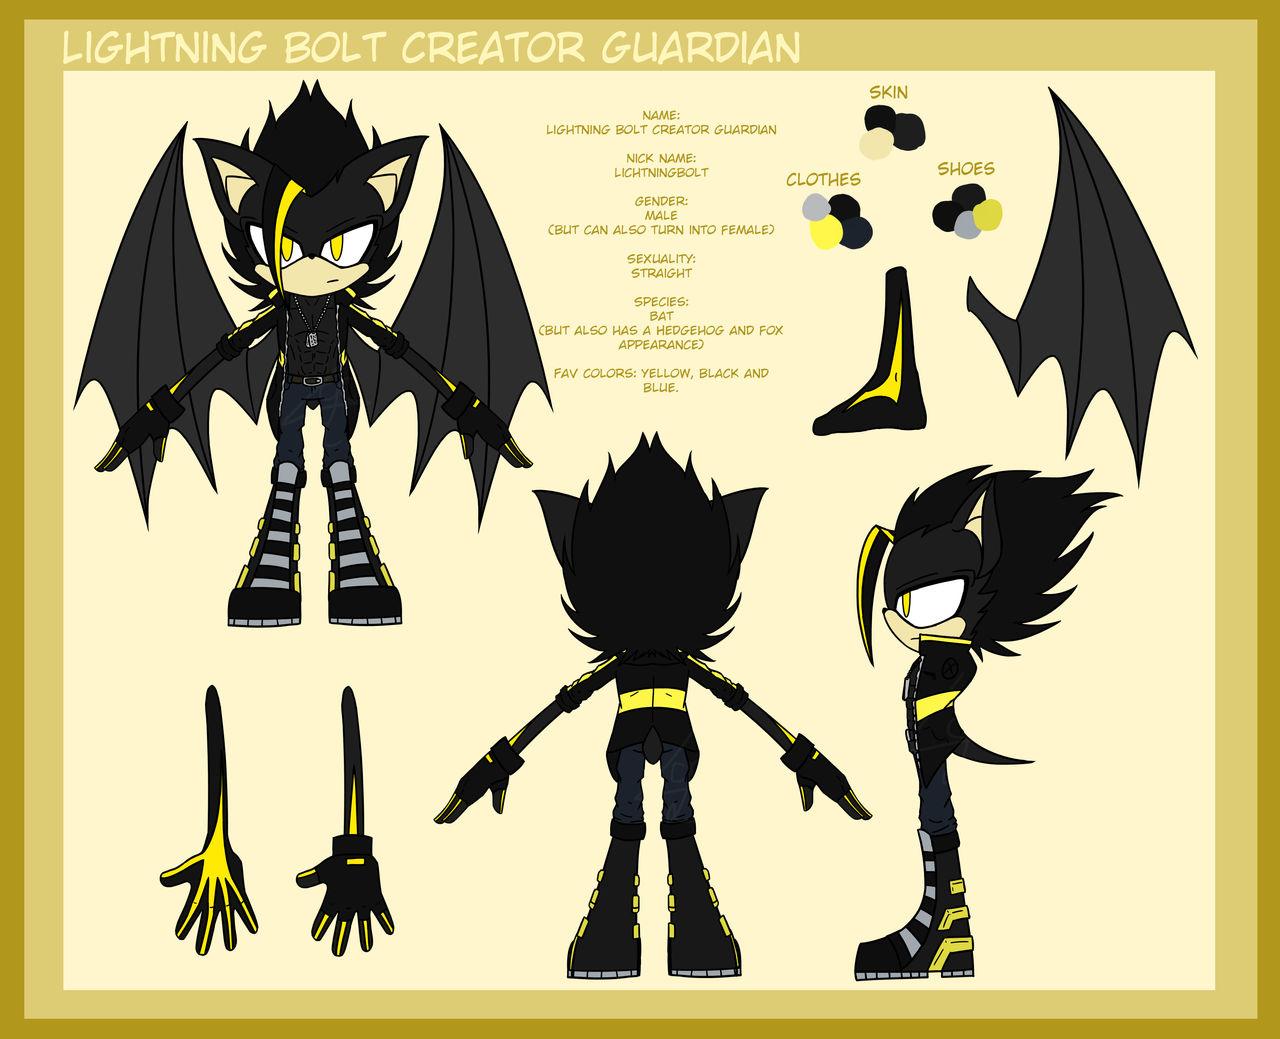 Lightning Bolt Creator Guardian Sonic Shape 2 By Lichtningbolt On Deviantart